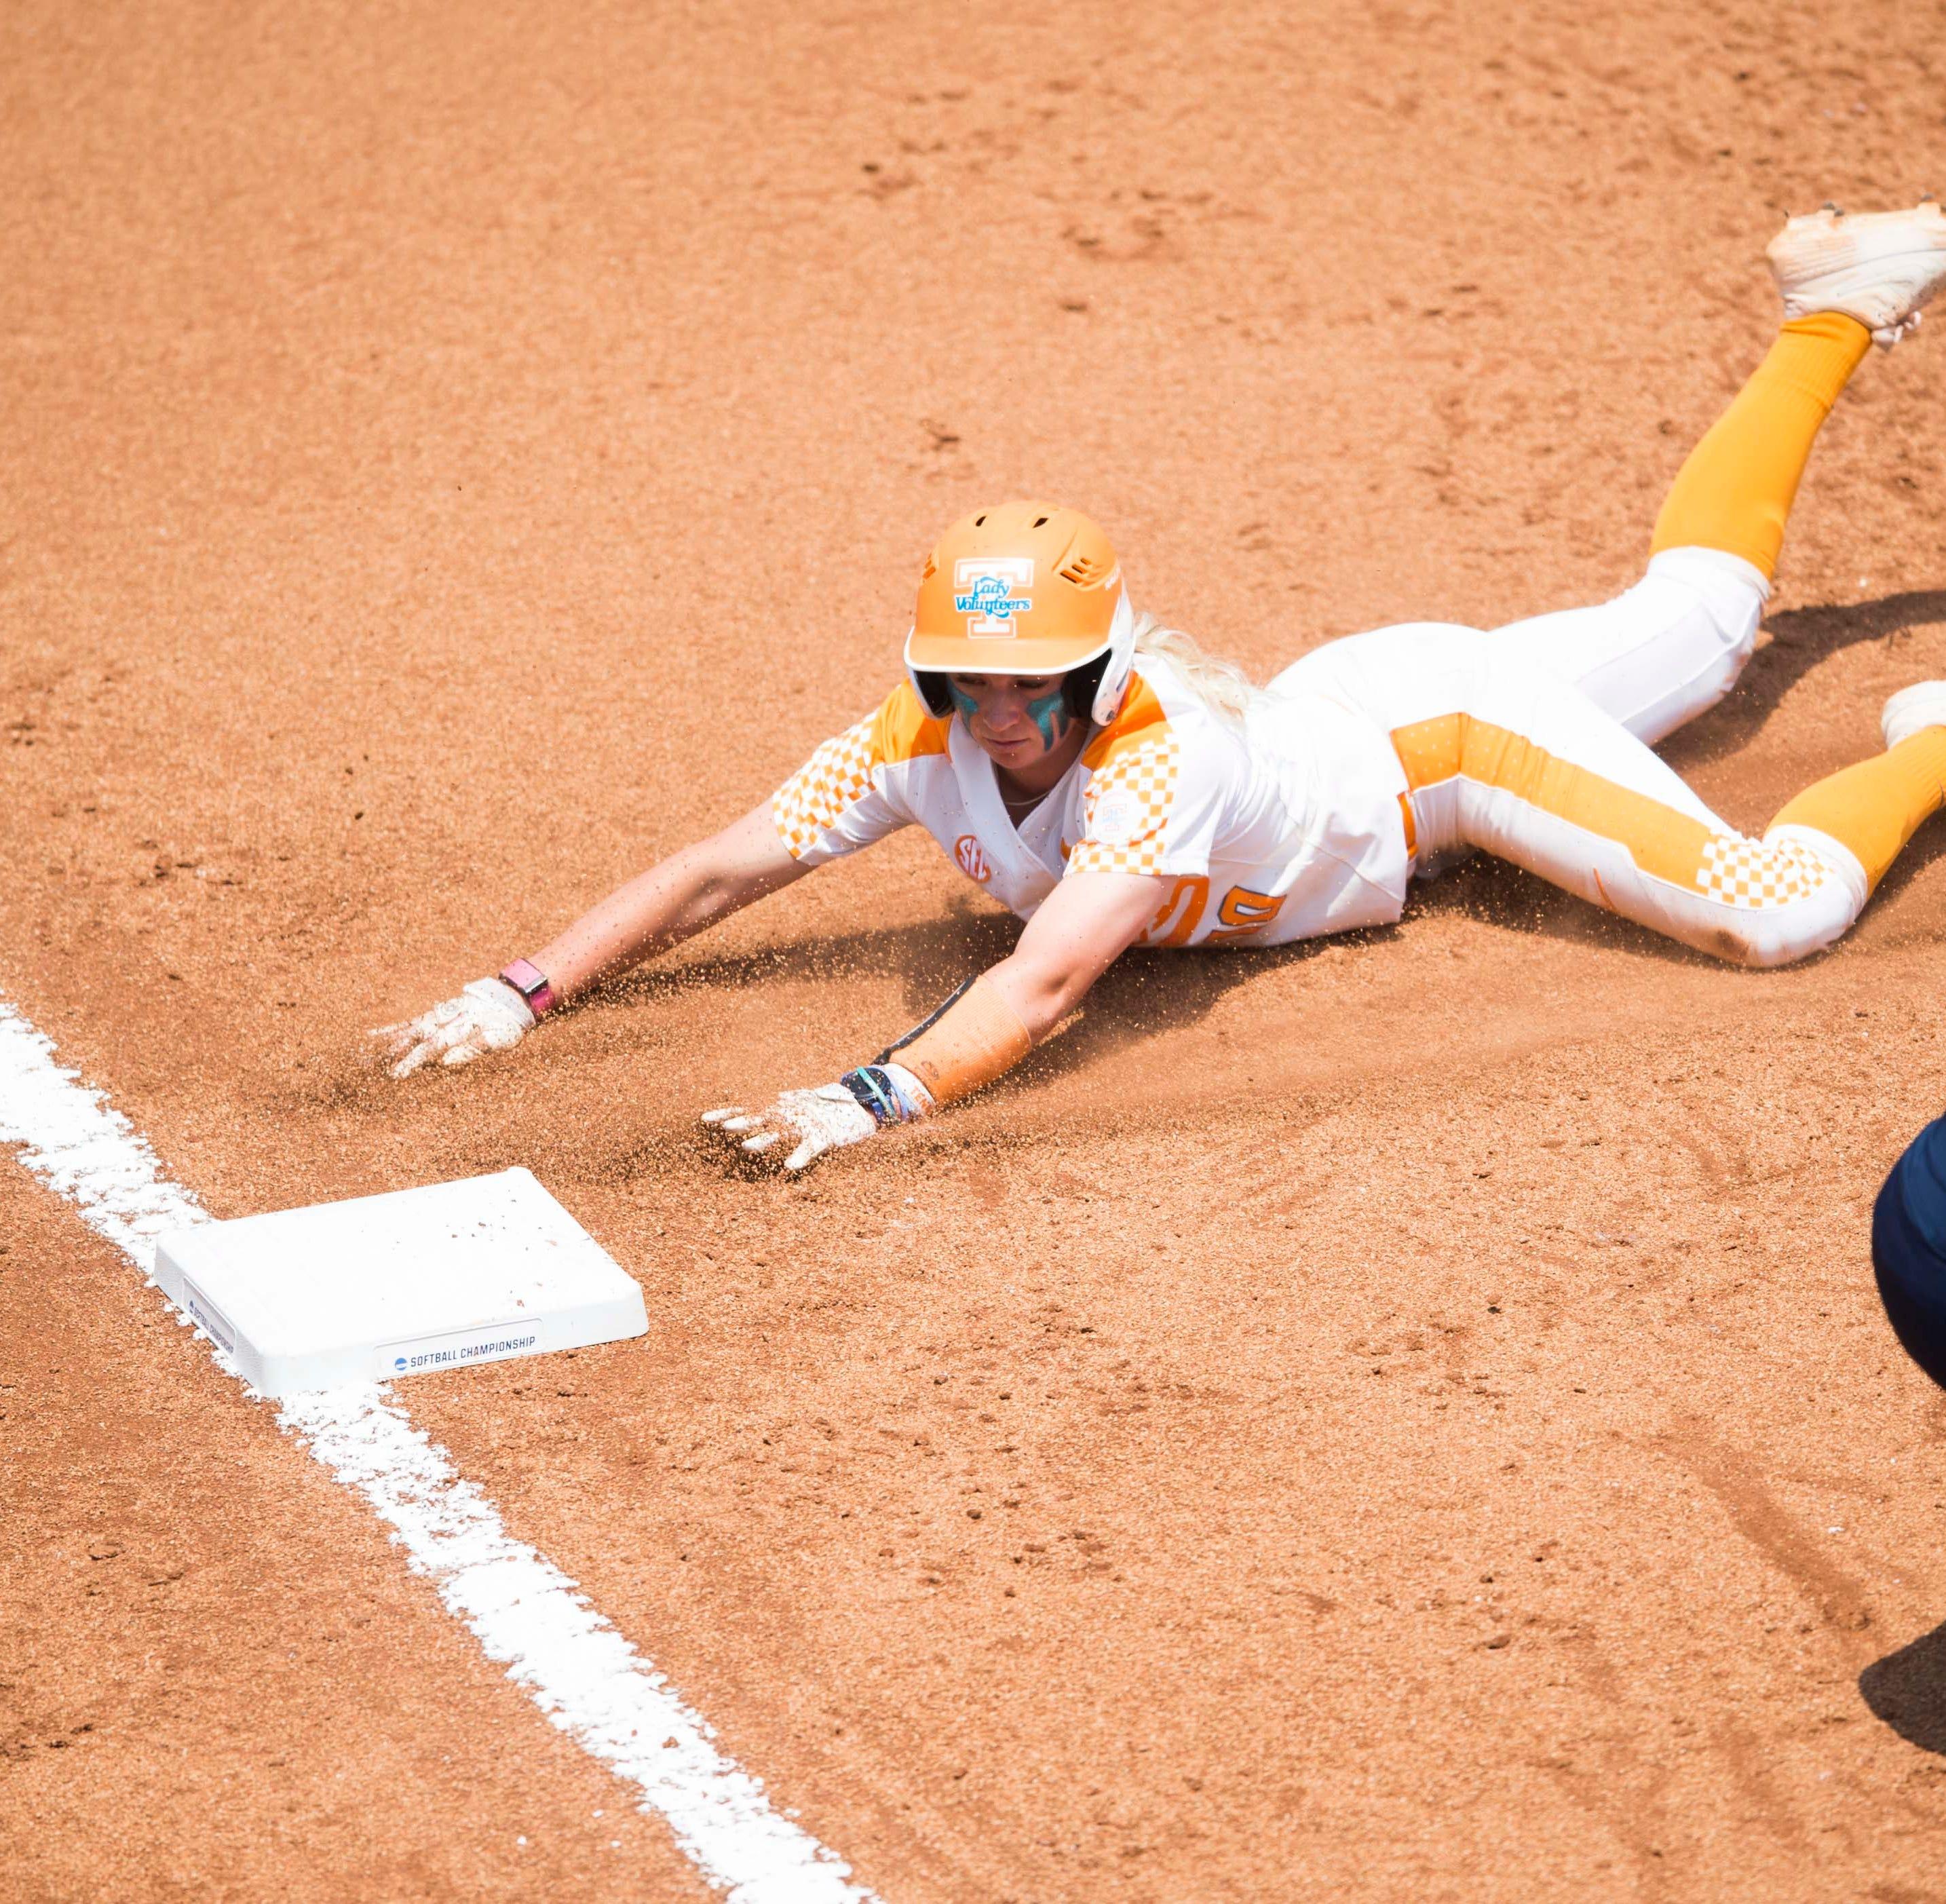 Lady Vols softball advances to Super Regional on Ashley Morgan's clutch double